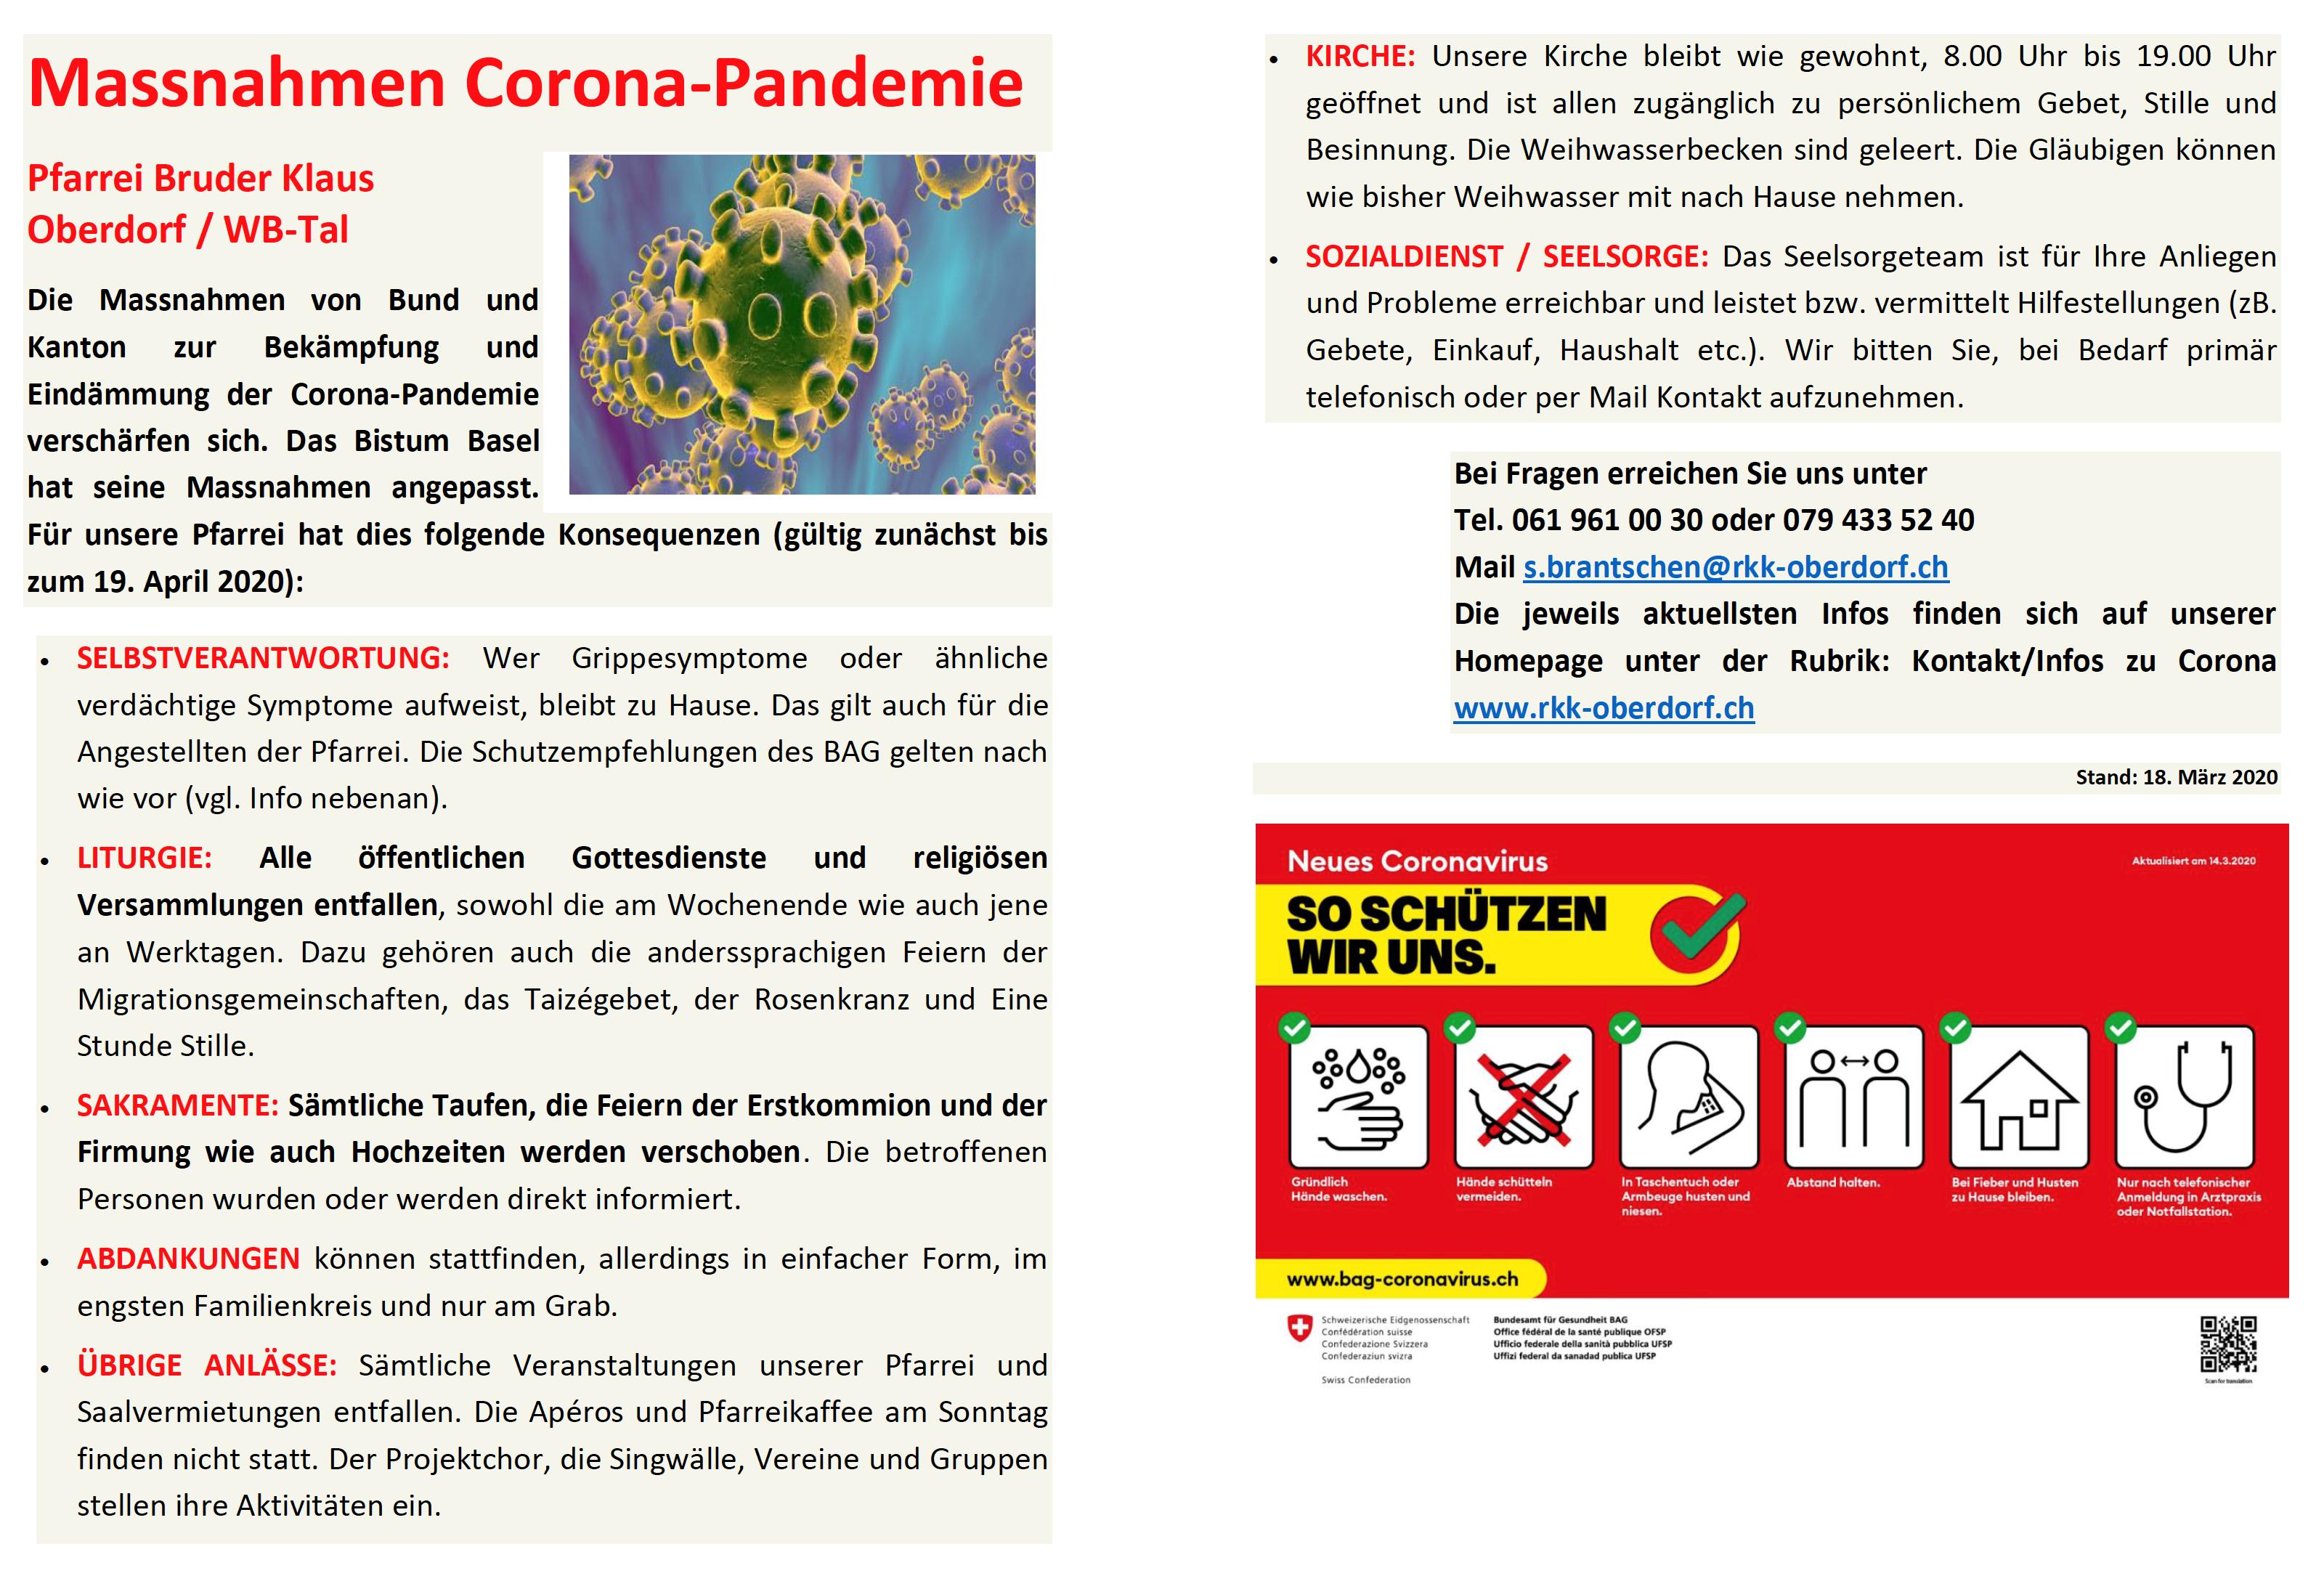 Maßnahmen Corona